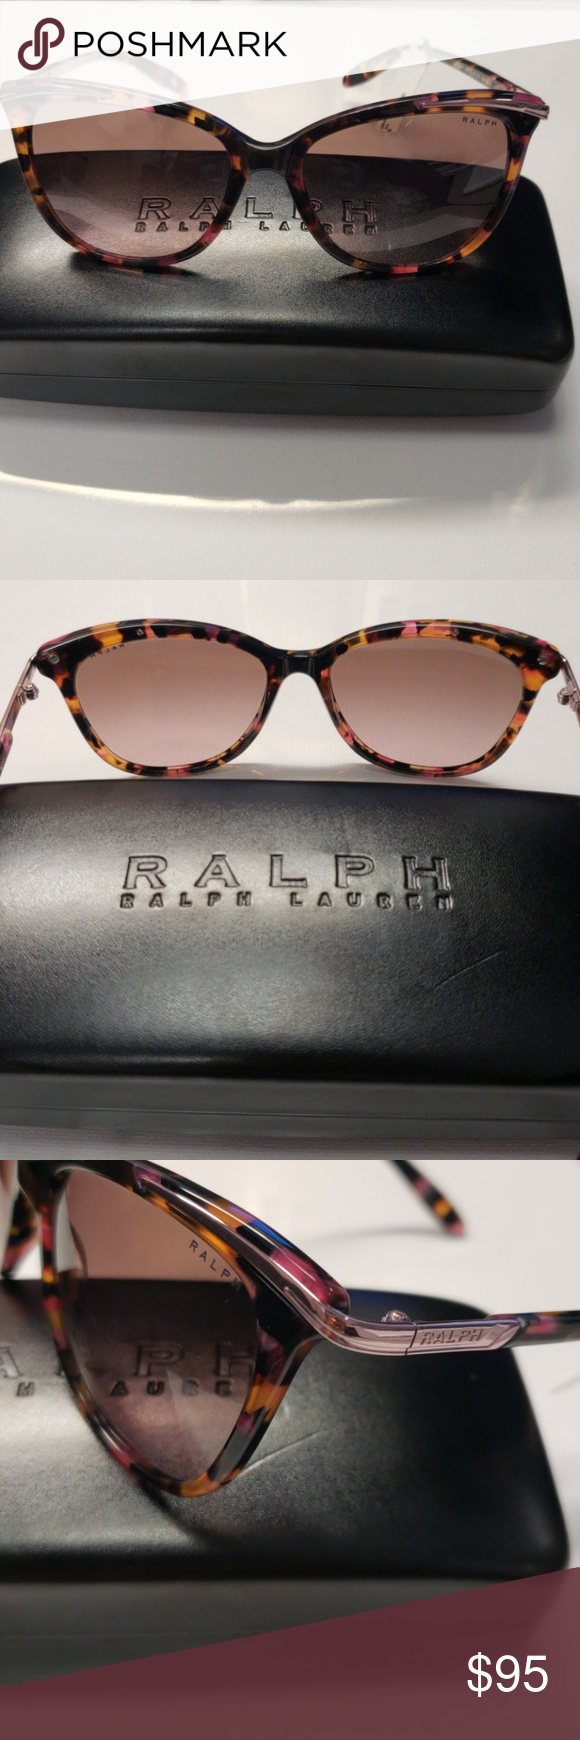 a95513f601 Ralph Lauren RA5203 Cat Eye Sunglassess Frame Color  146114 Pink Marble  Lens Color  Brown Rose Gradient Polarized Lens  No Frame Shape  Cat Eye  Gender  ...